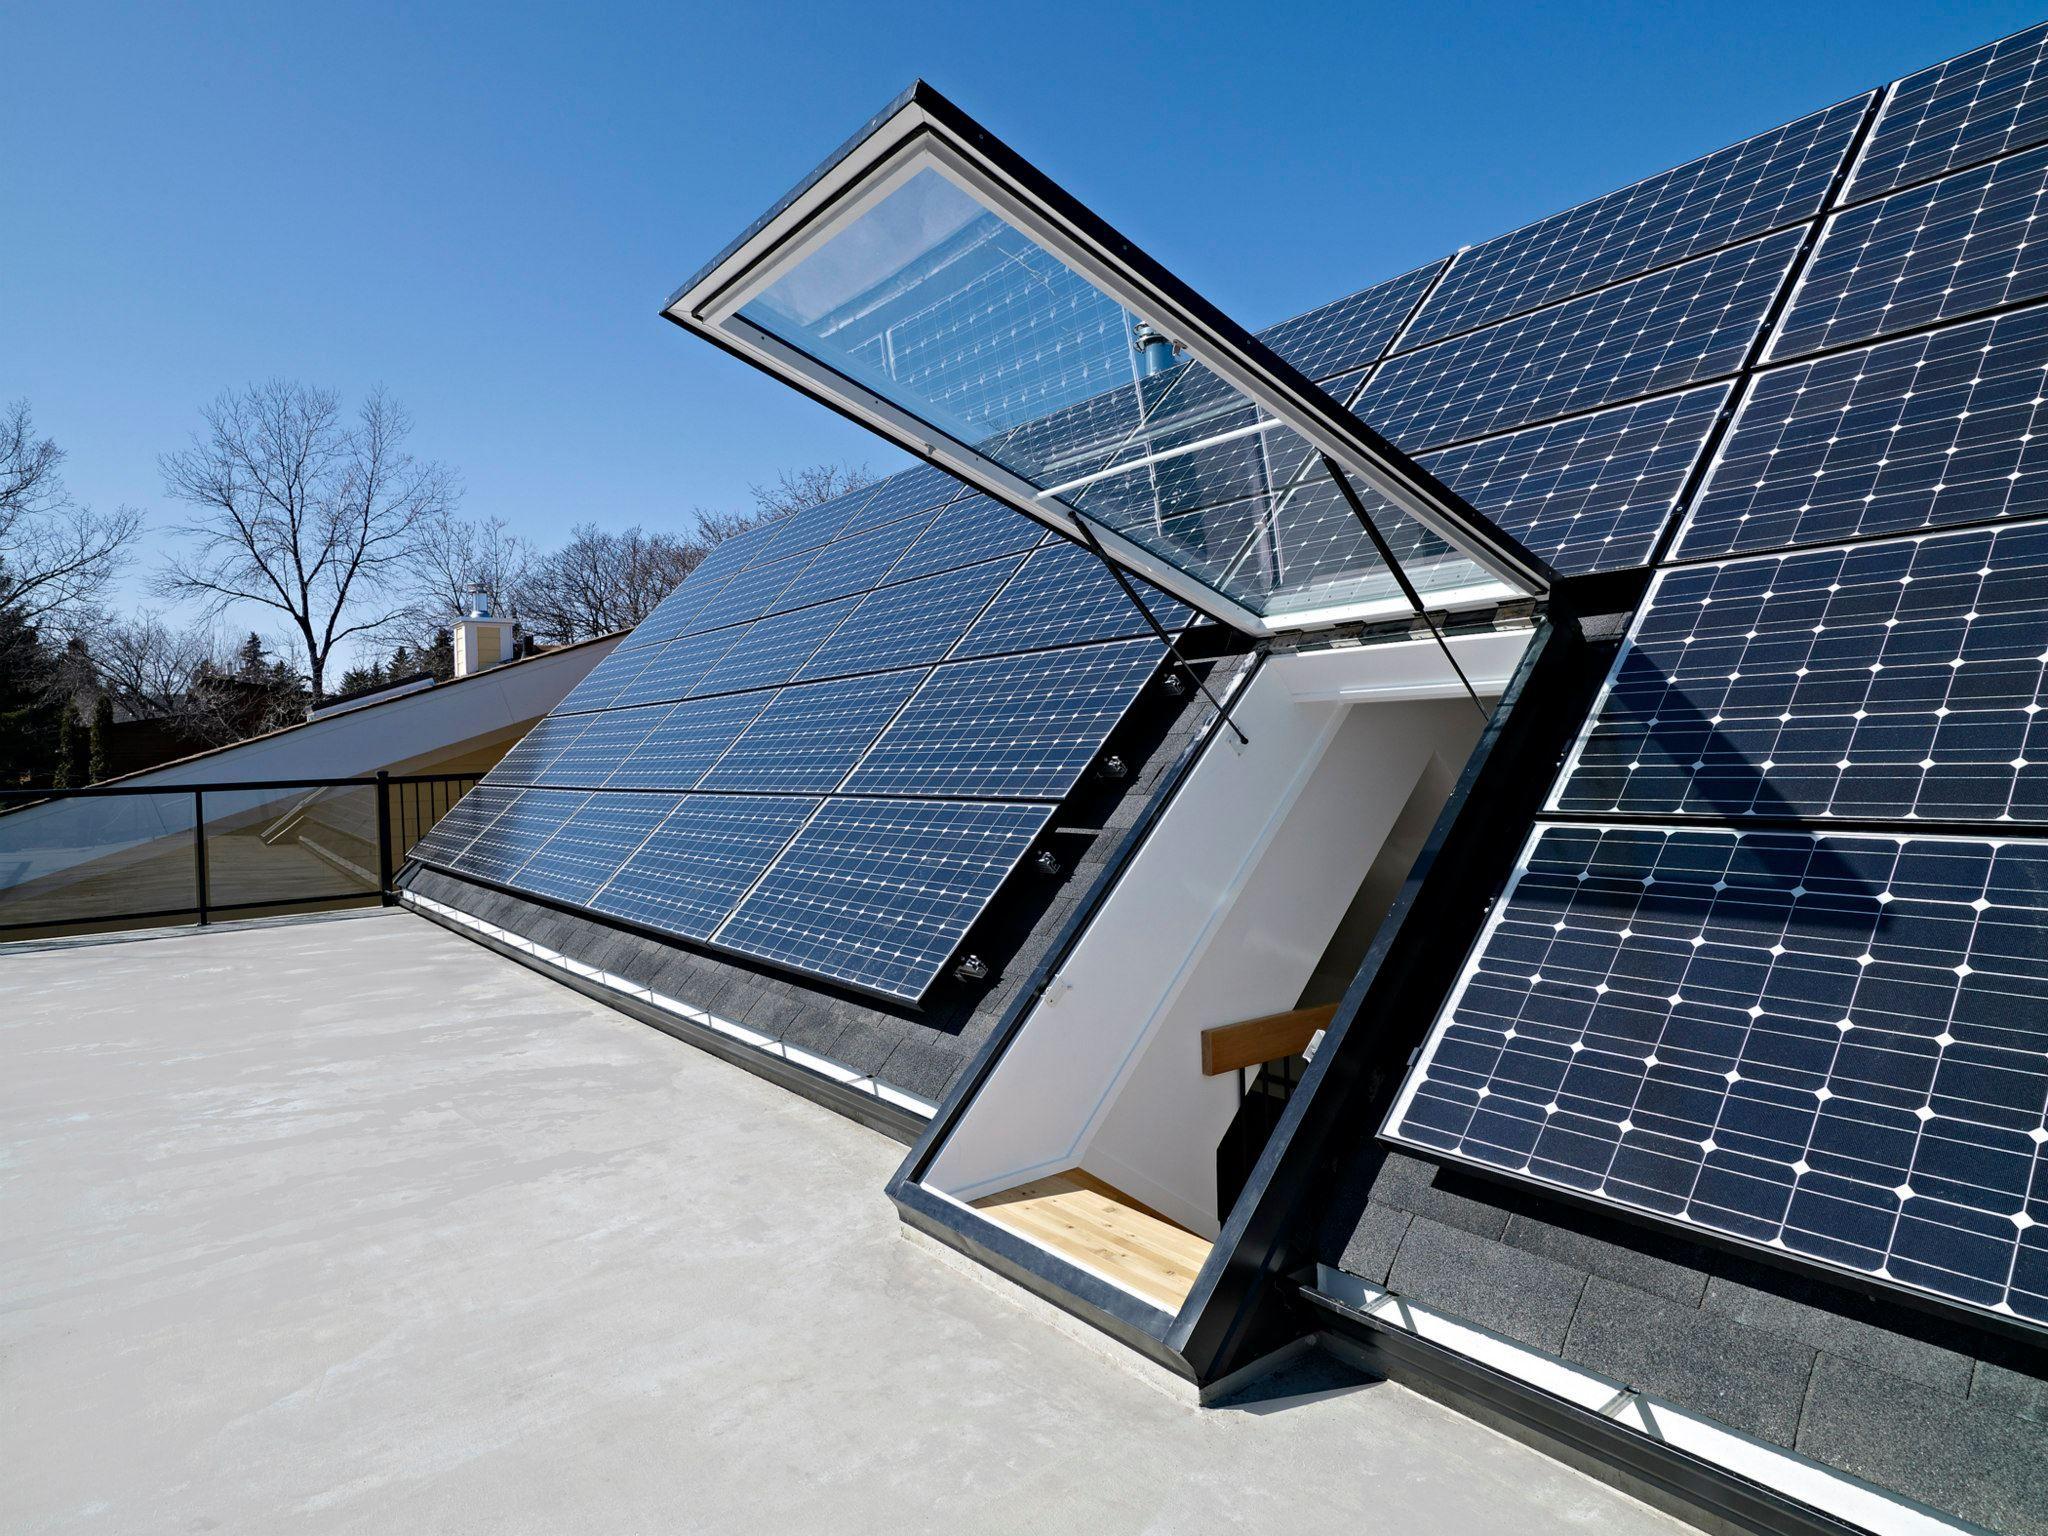 Home roof access glazed roof hatch glazed roof hatch - Alternate Door For Pop Up Roof Access Door In Roof